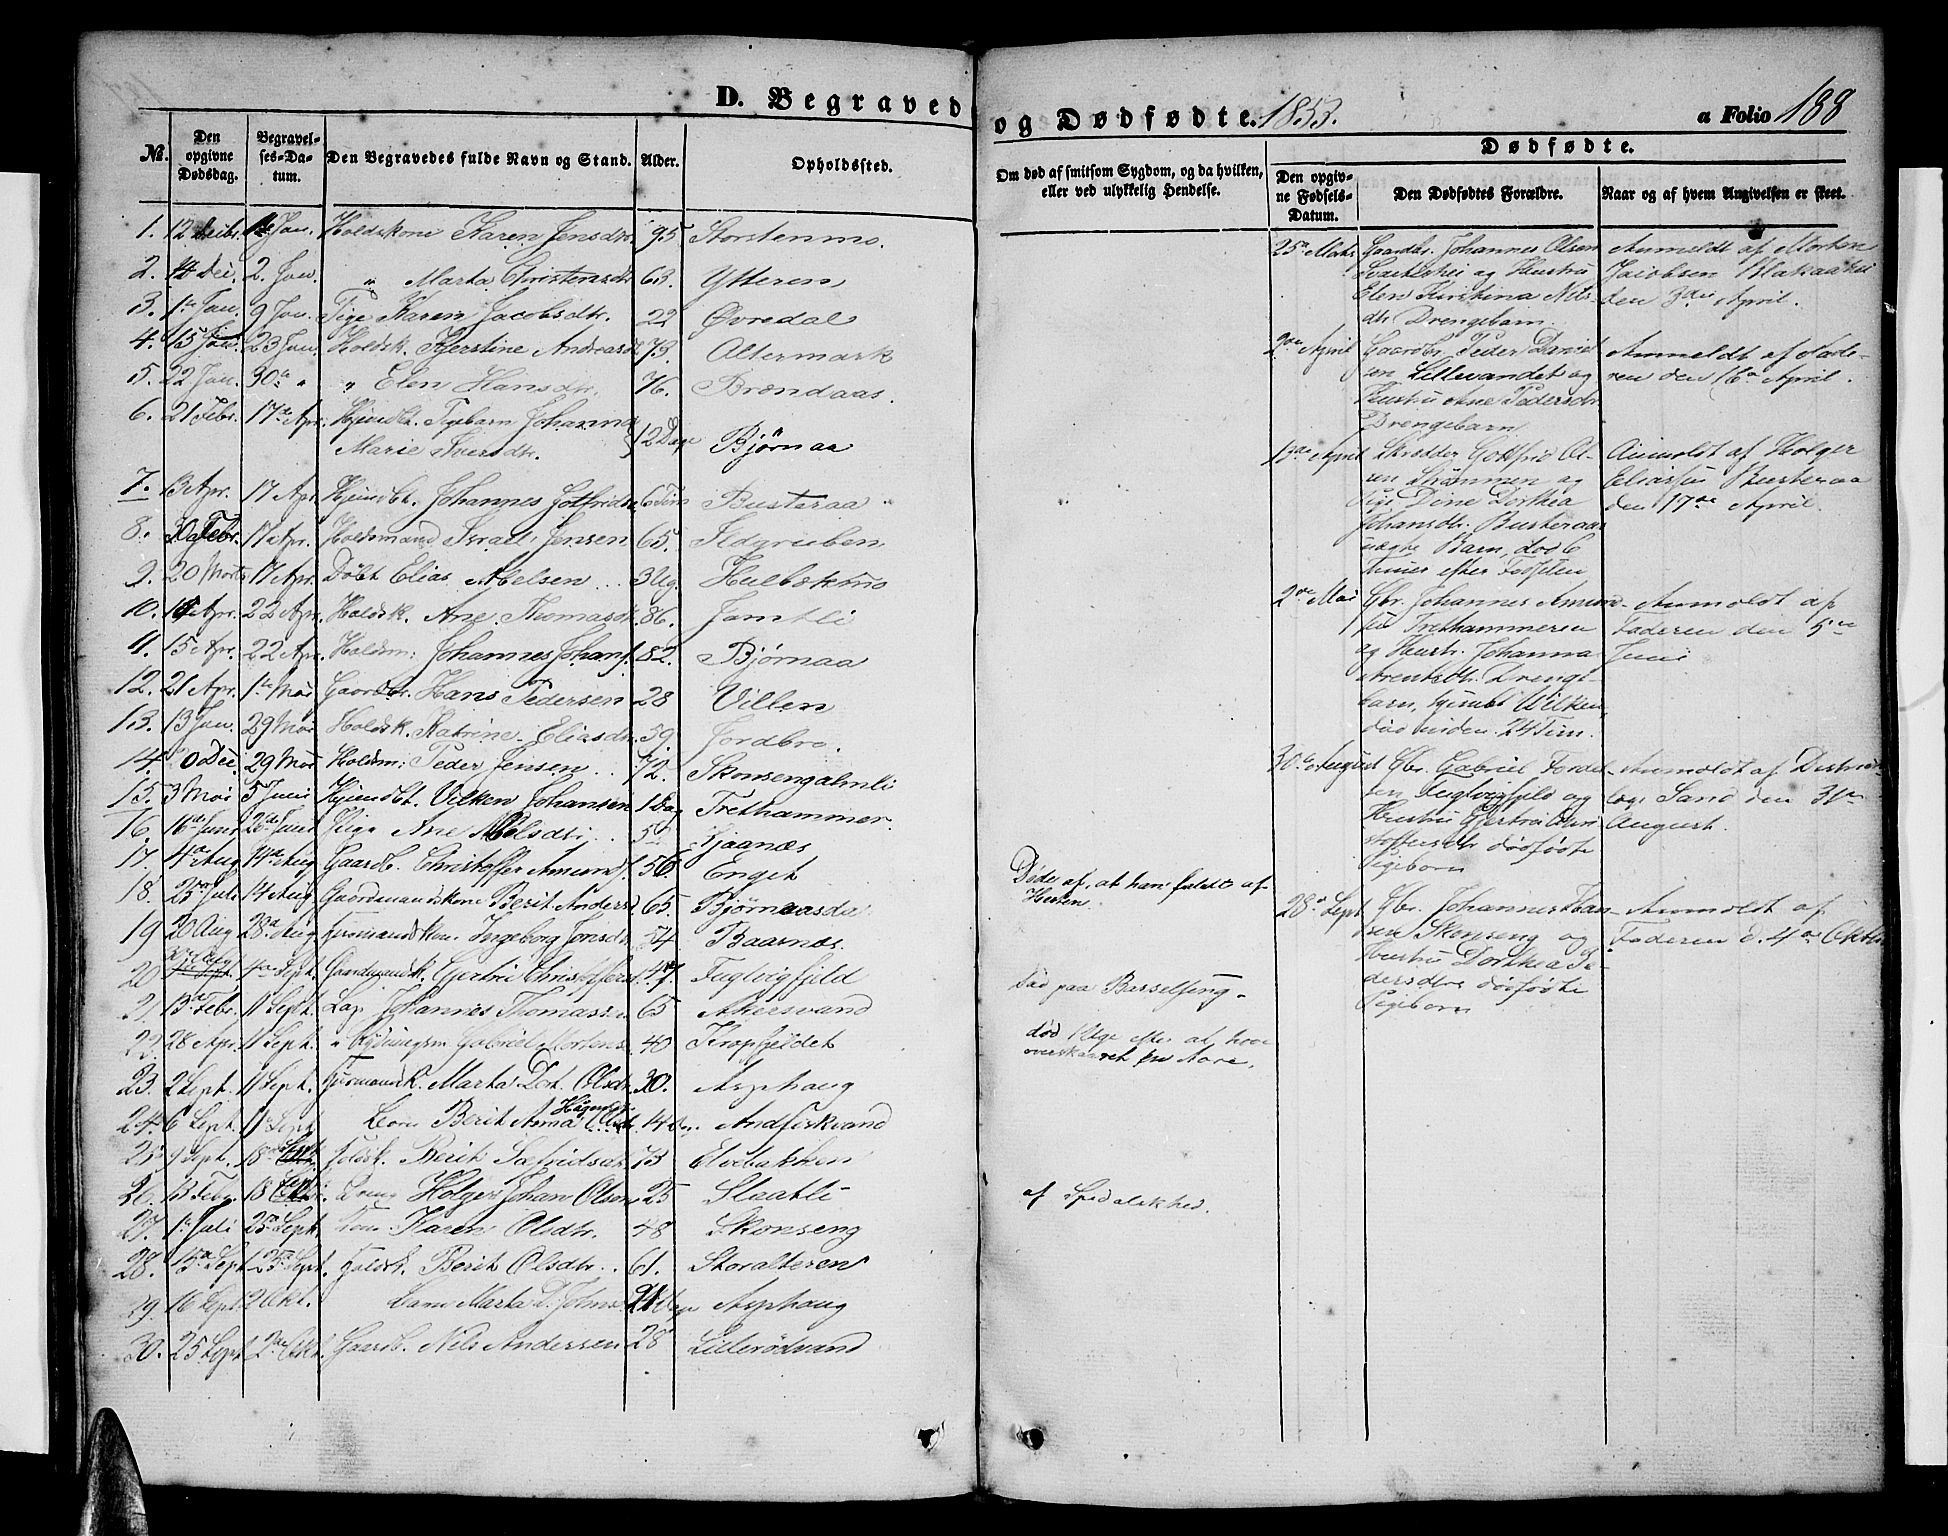 SAT, Ministerialprotokoller, klokkerbøker og fødselsregistre - Nordland, 827/L0414: Klokkerbok nr. 827C03, 1853-1865, s. 188